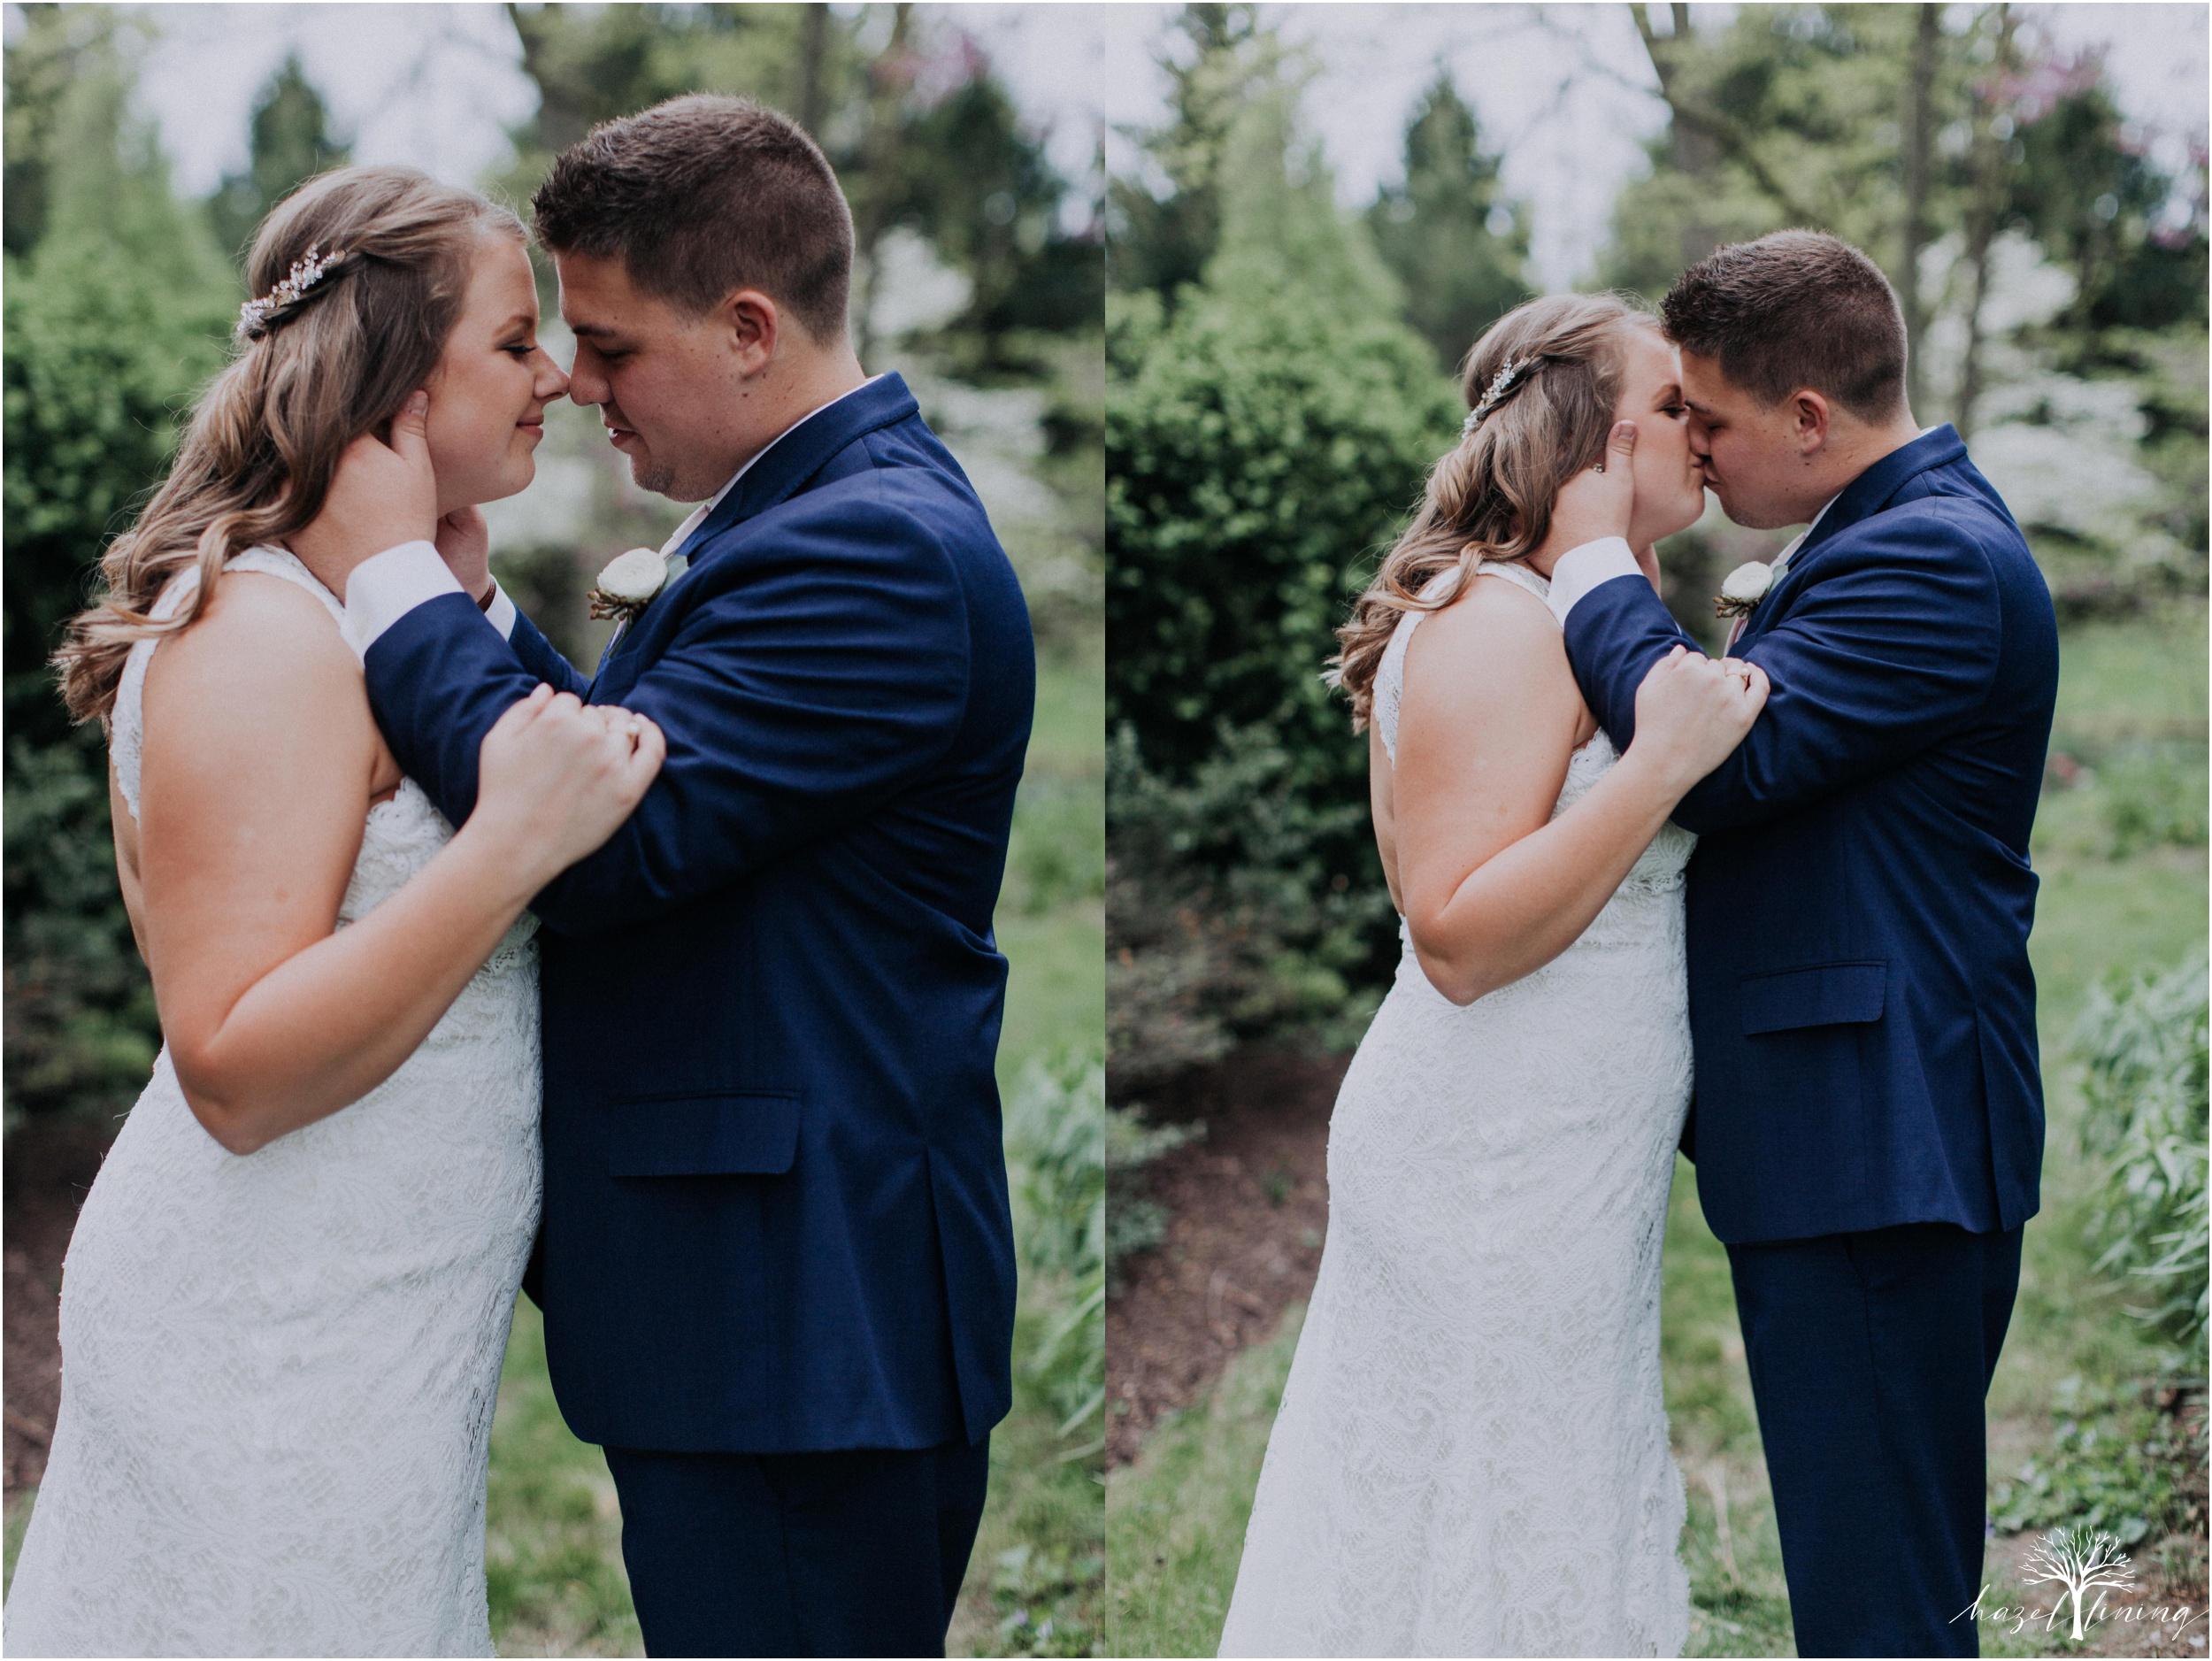 hazel-lining-travel-wedding-elopement-photography-abby-skyler-hunt-the-willis-house-york-pennsylvania-outdoor-estate-wedding_0038.jpg